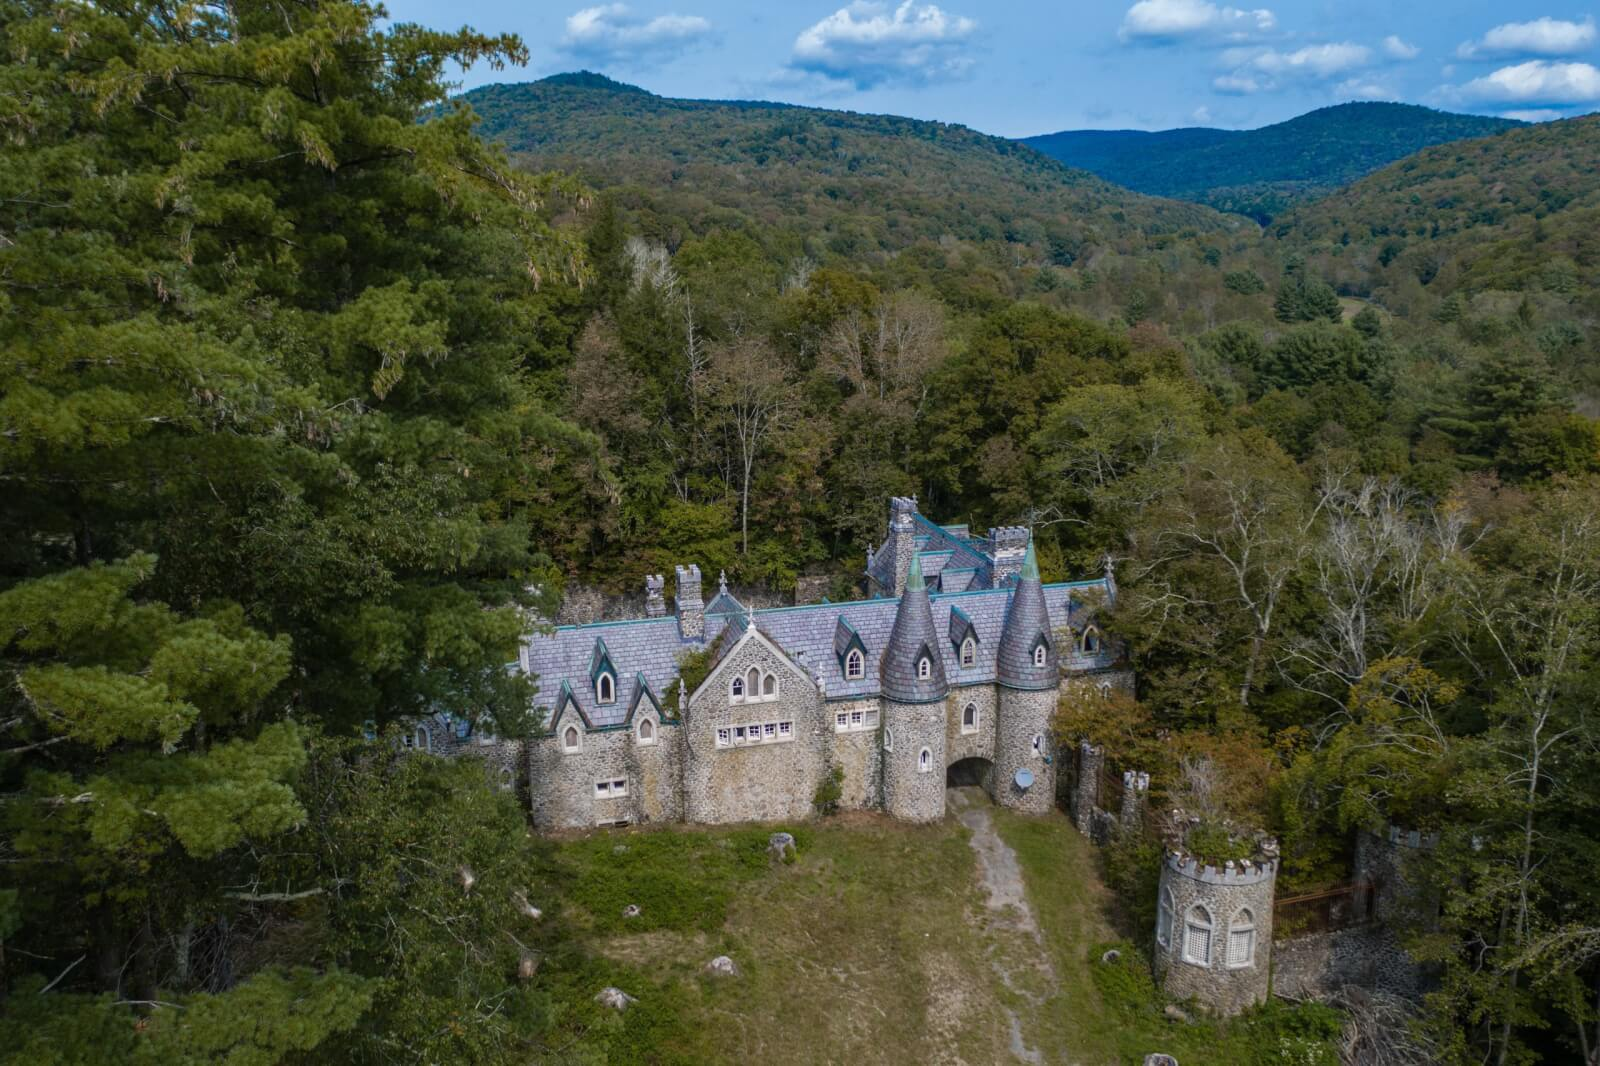 Dundas Castle in Roscoe New York in the Catskills